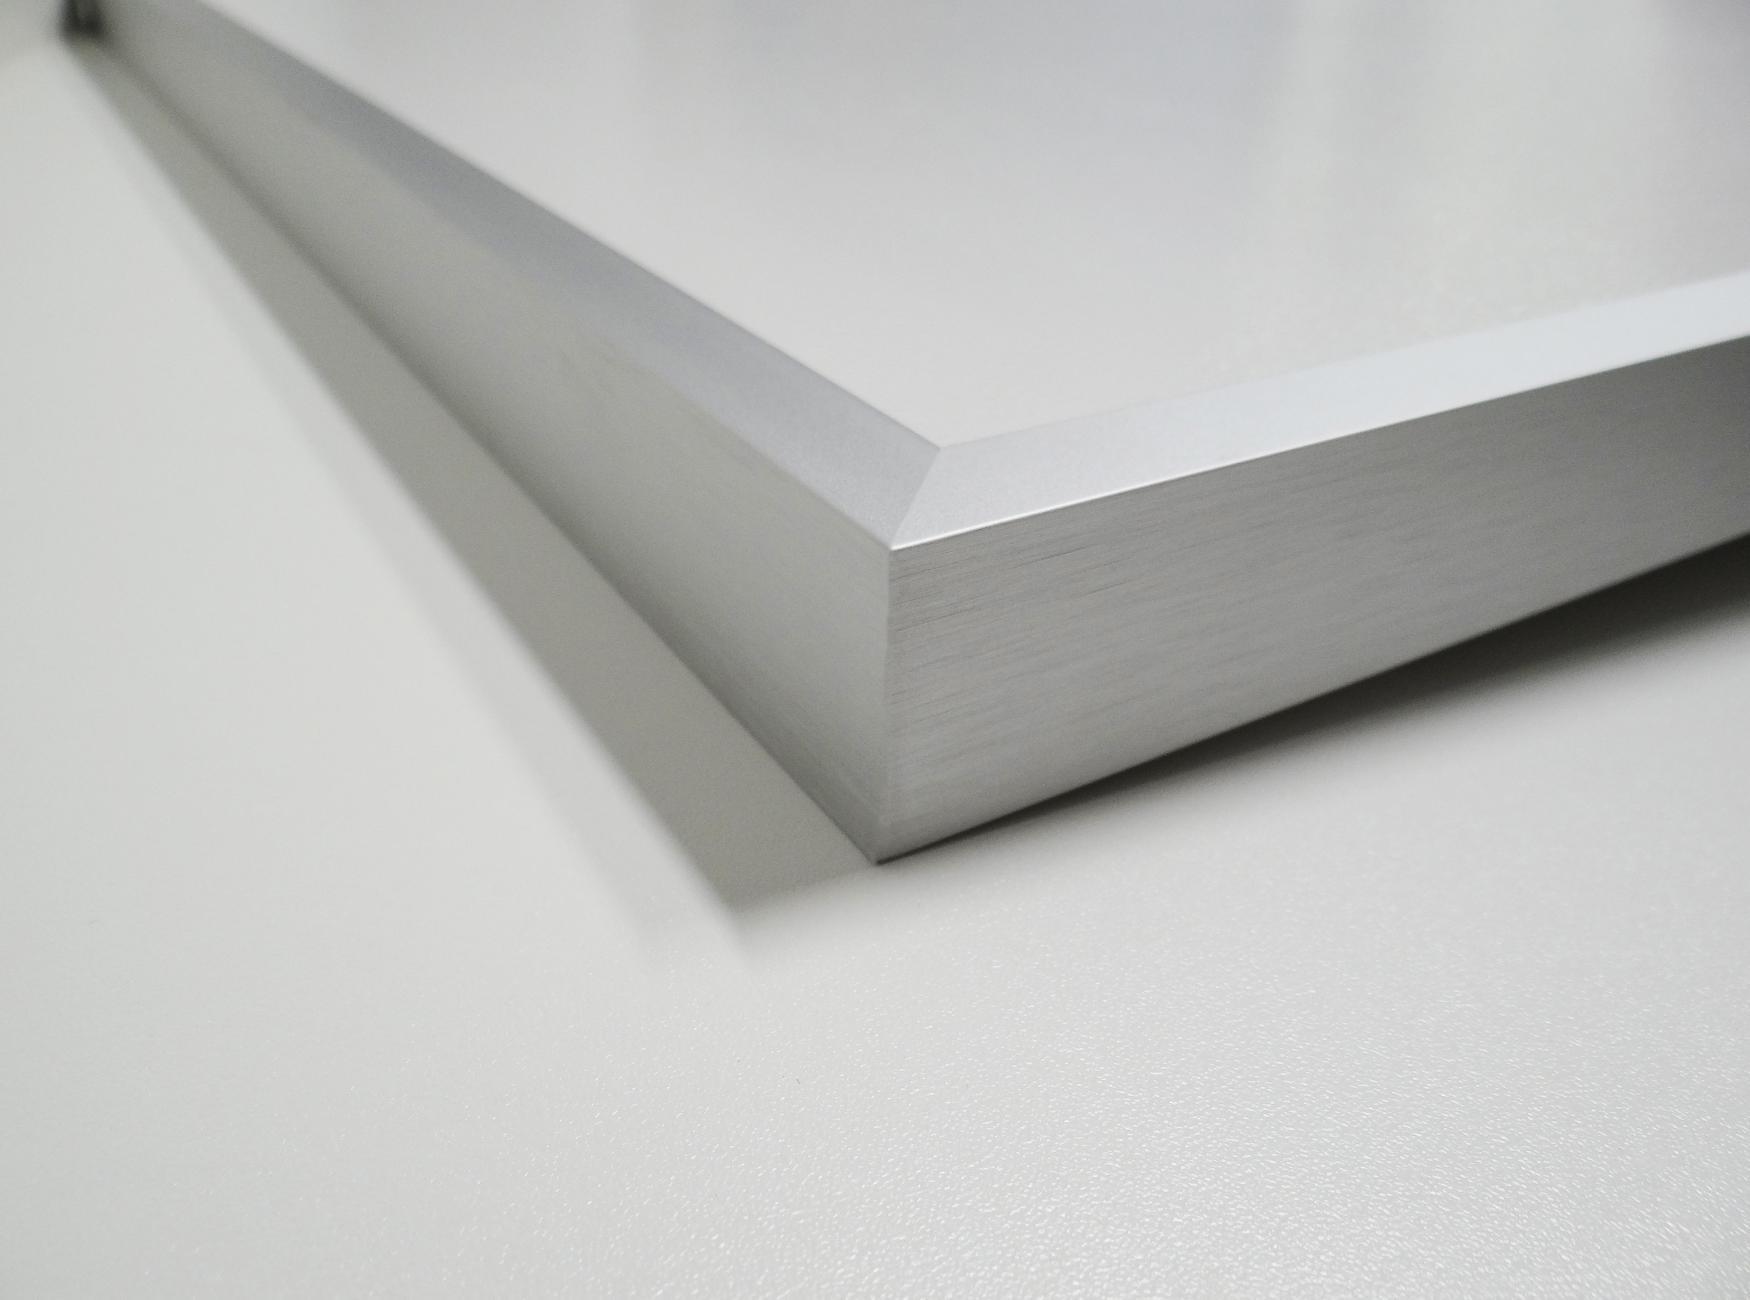 PowerSun Reflex, glatt, weiss, Rahmen, Knebel infrarotheizungen